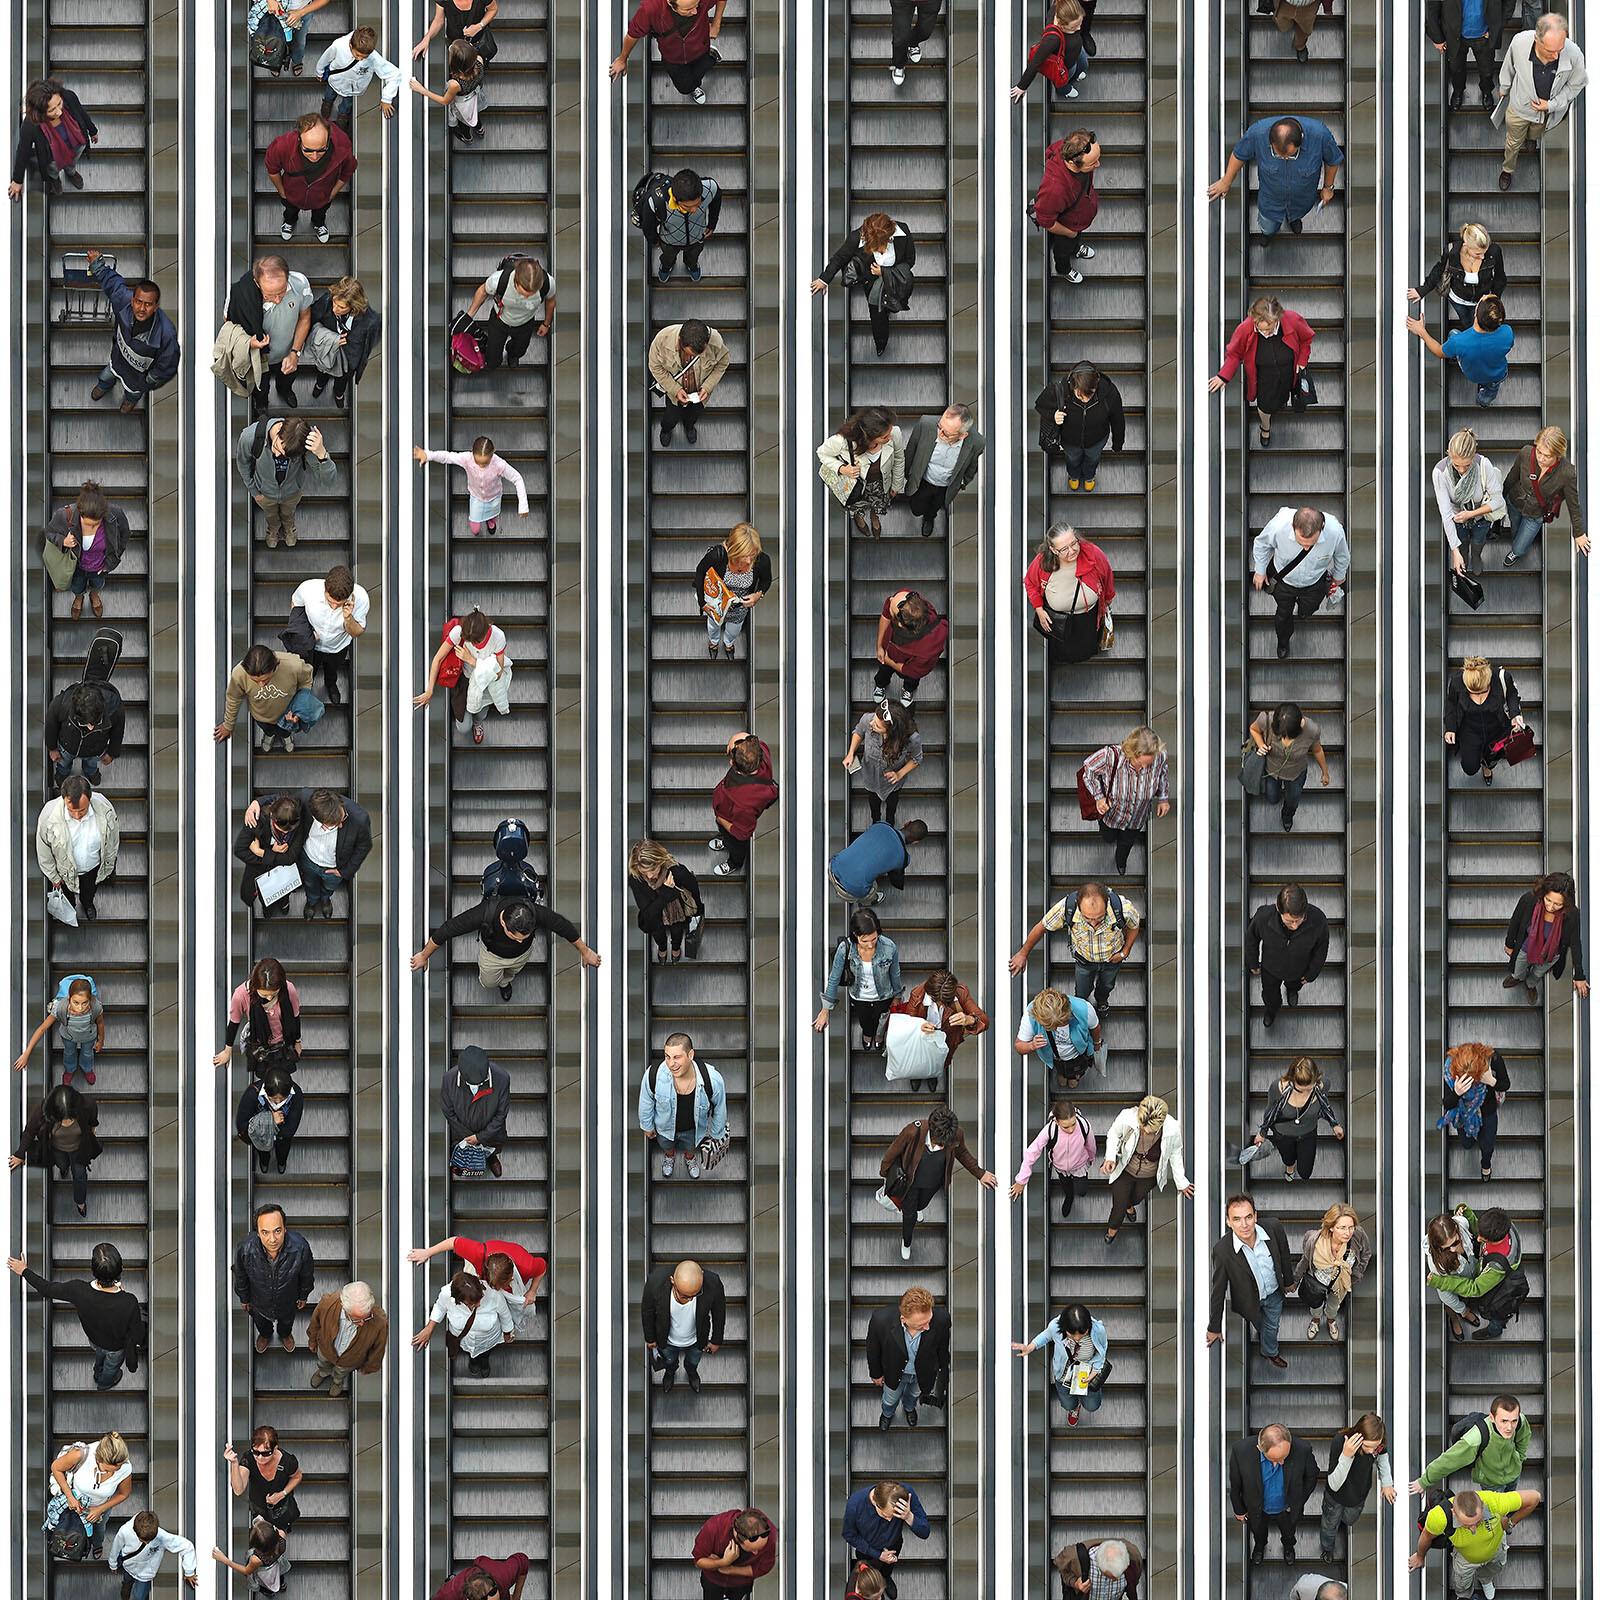 Escalator II - Michael Michlmayr